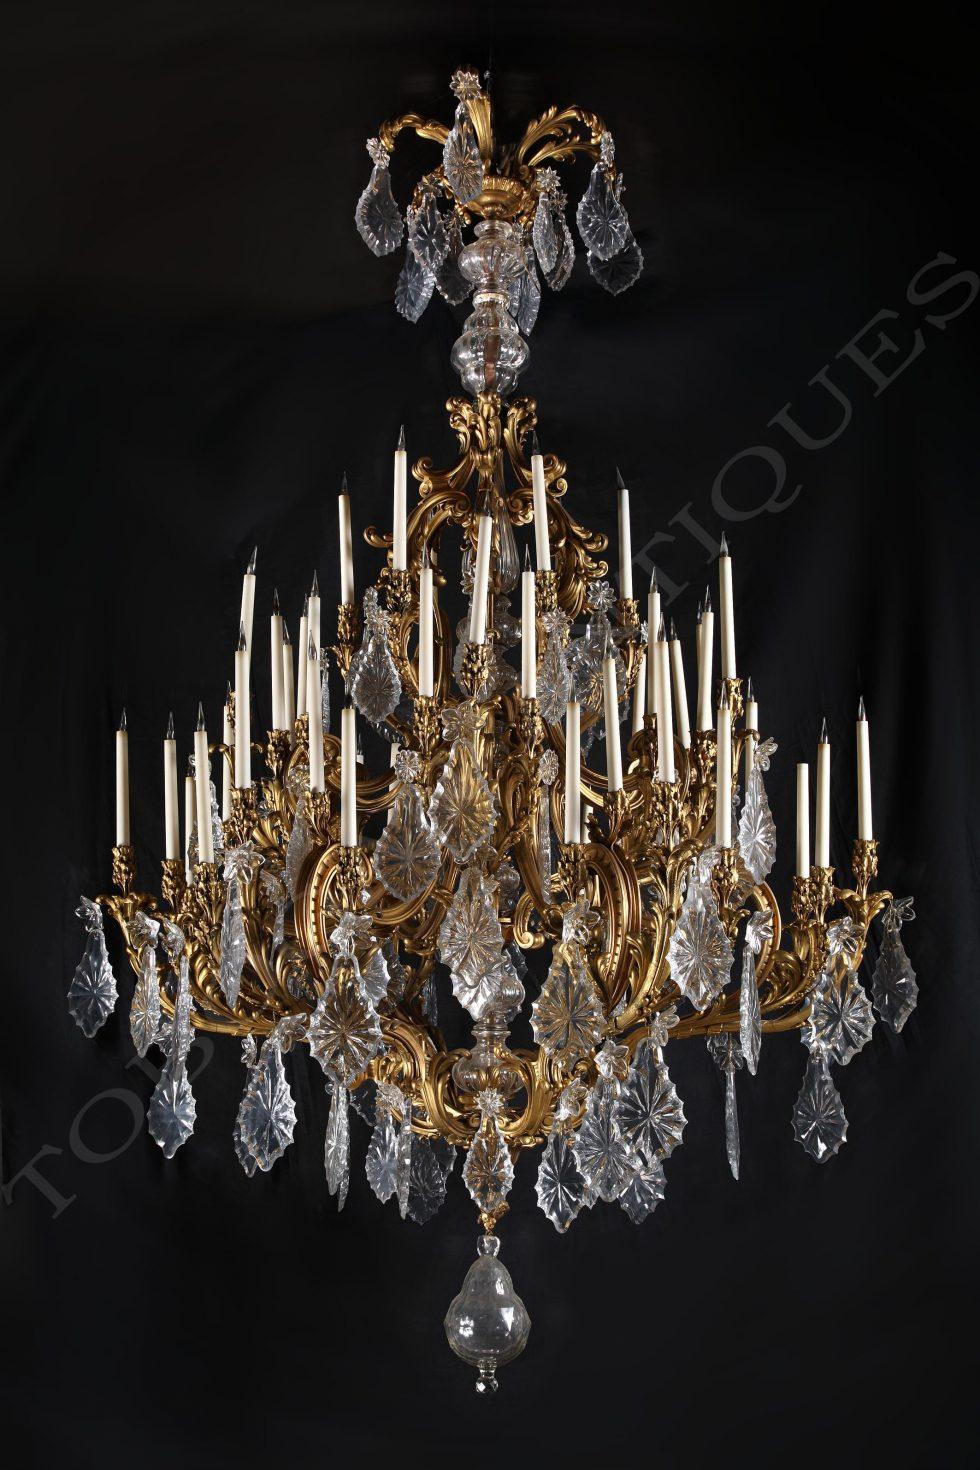 Baccarat <br/> Exceptionnel lustre